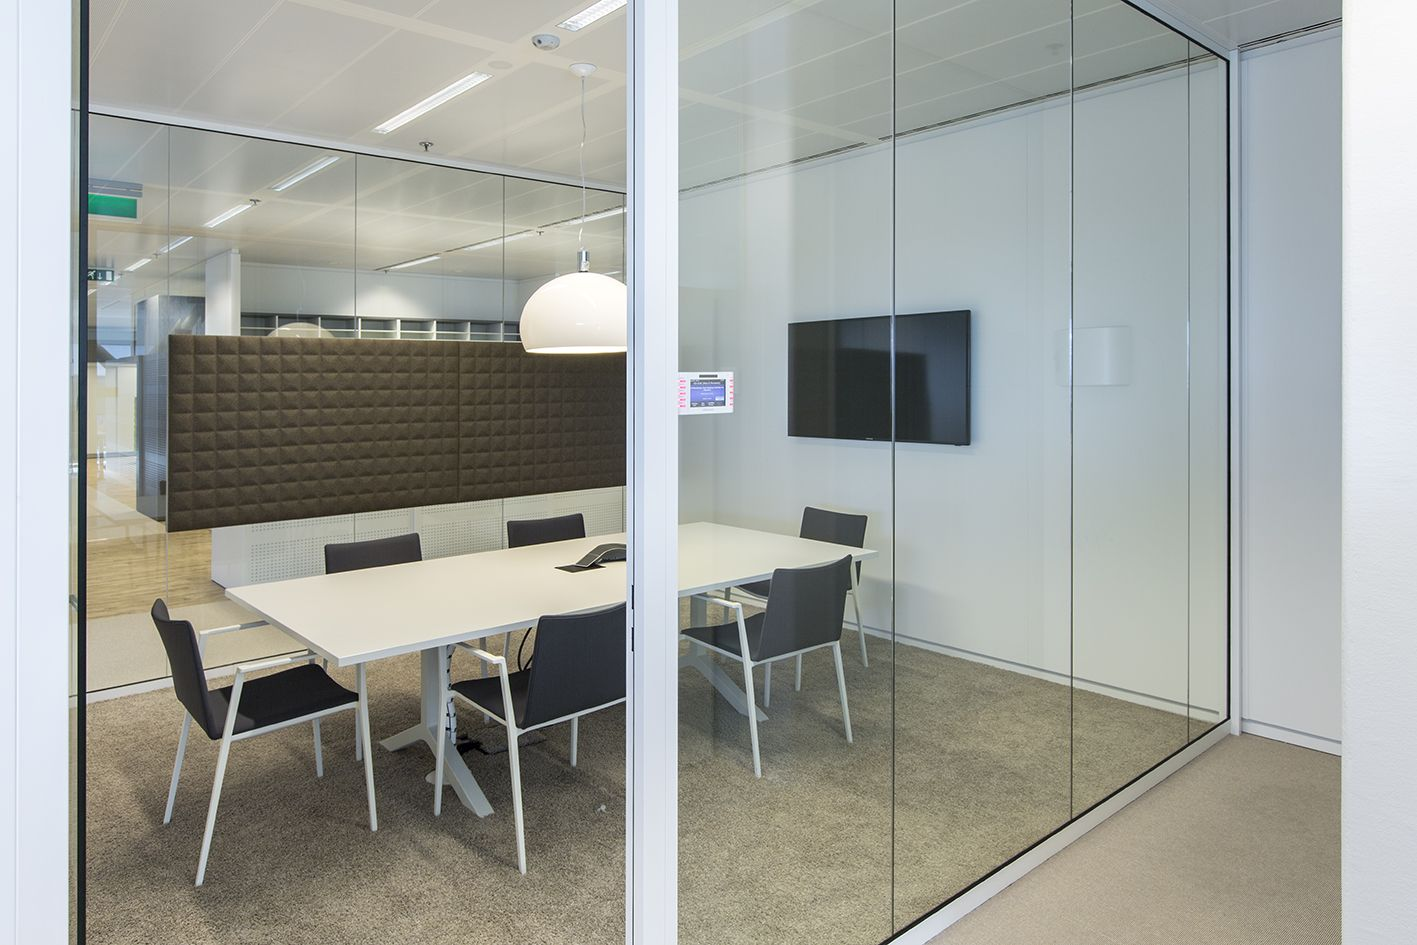 met het nieuwe interieur is er betere onderlinge communicatie en meer synergie interieur